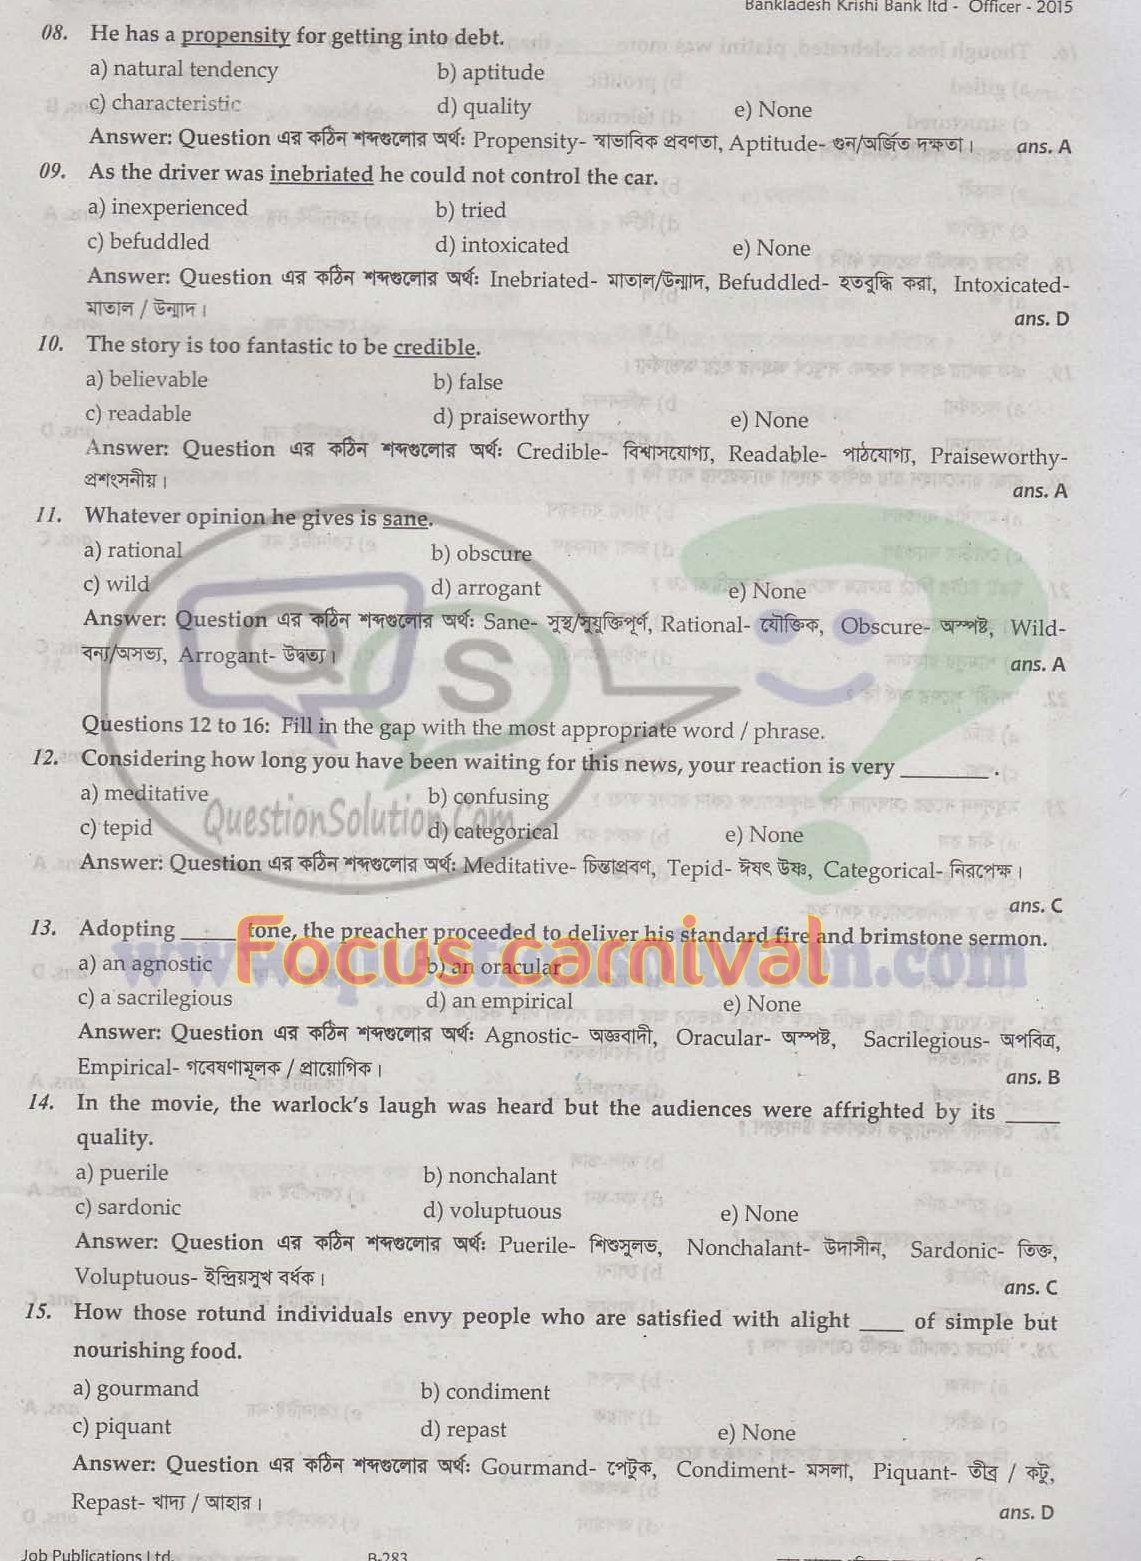 Bangladesh Krishi Bank MCQ Exam Questions with Answer (PDF